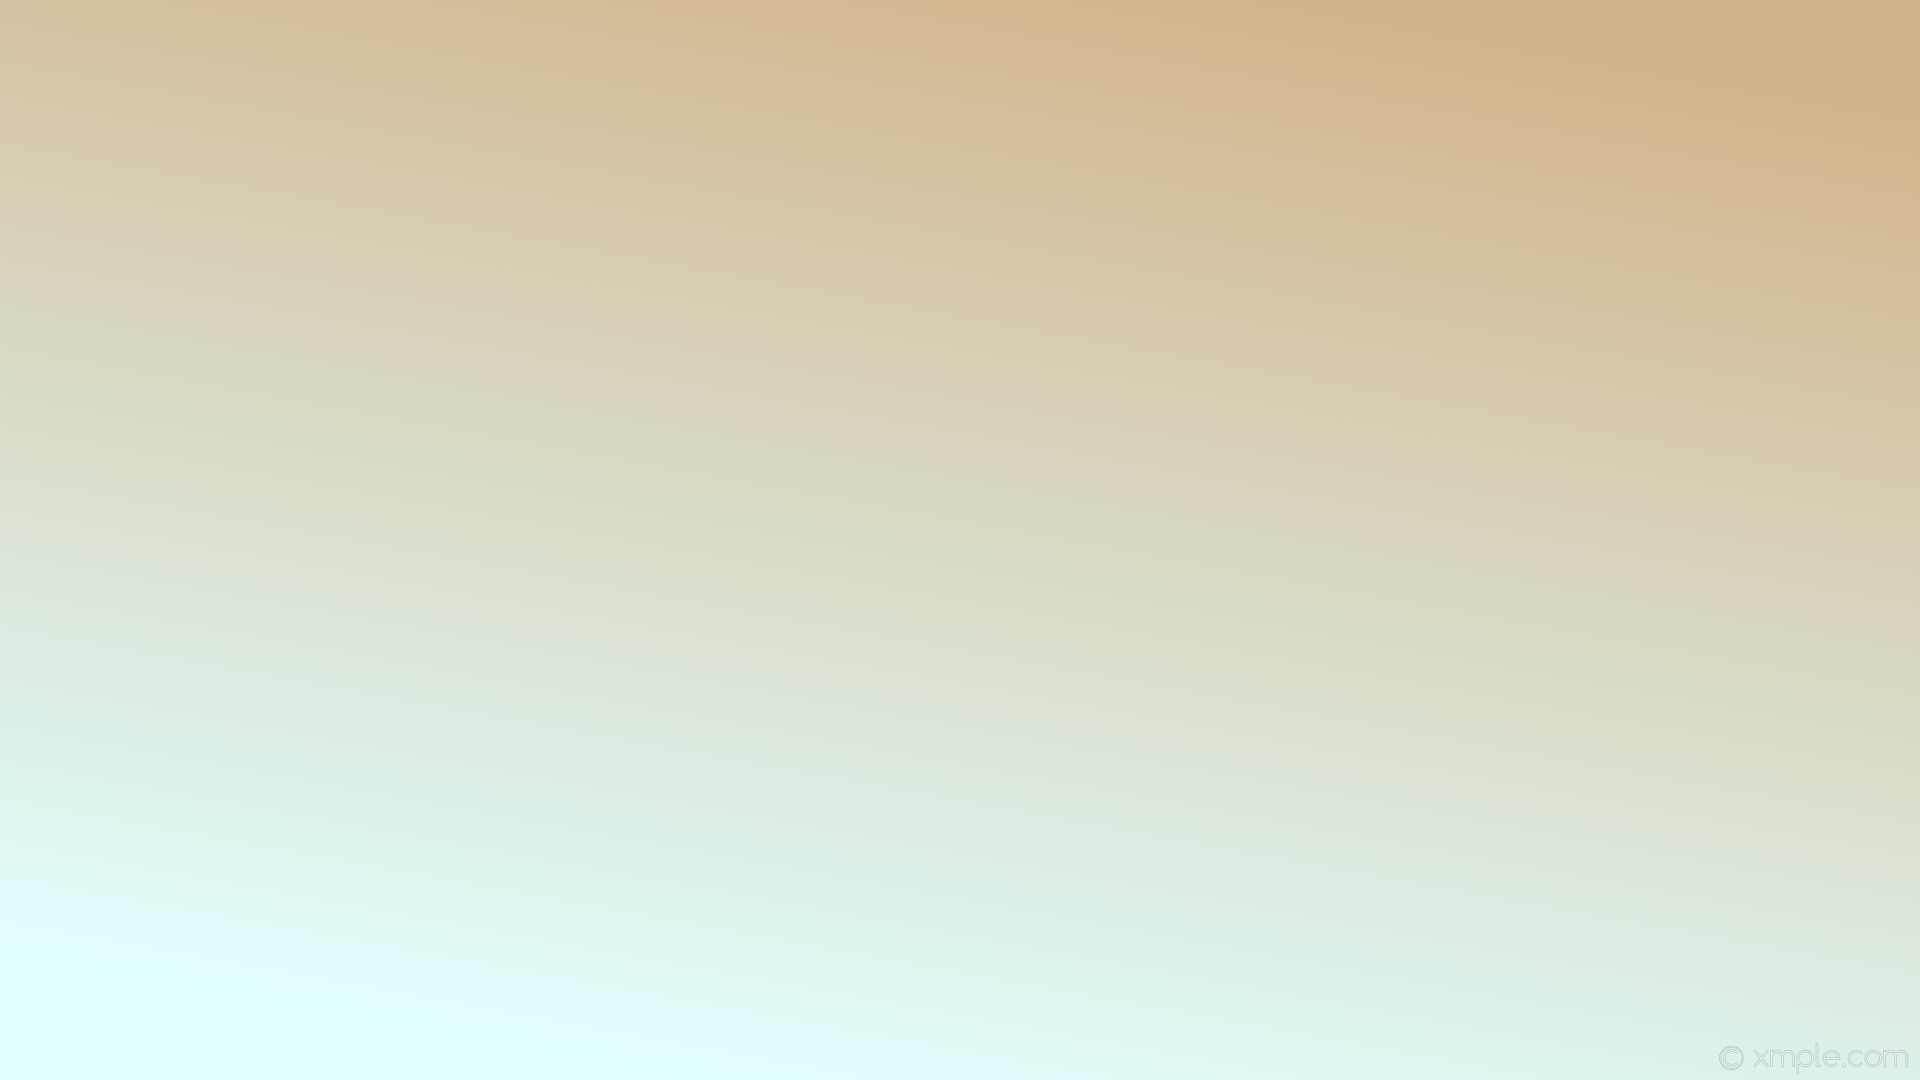 1920x1080 wallpaper gradient blue brown linear tan light cyan d2b48c e0ffff 60